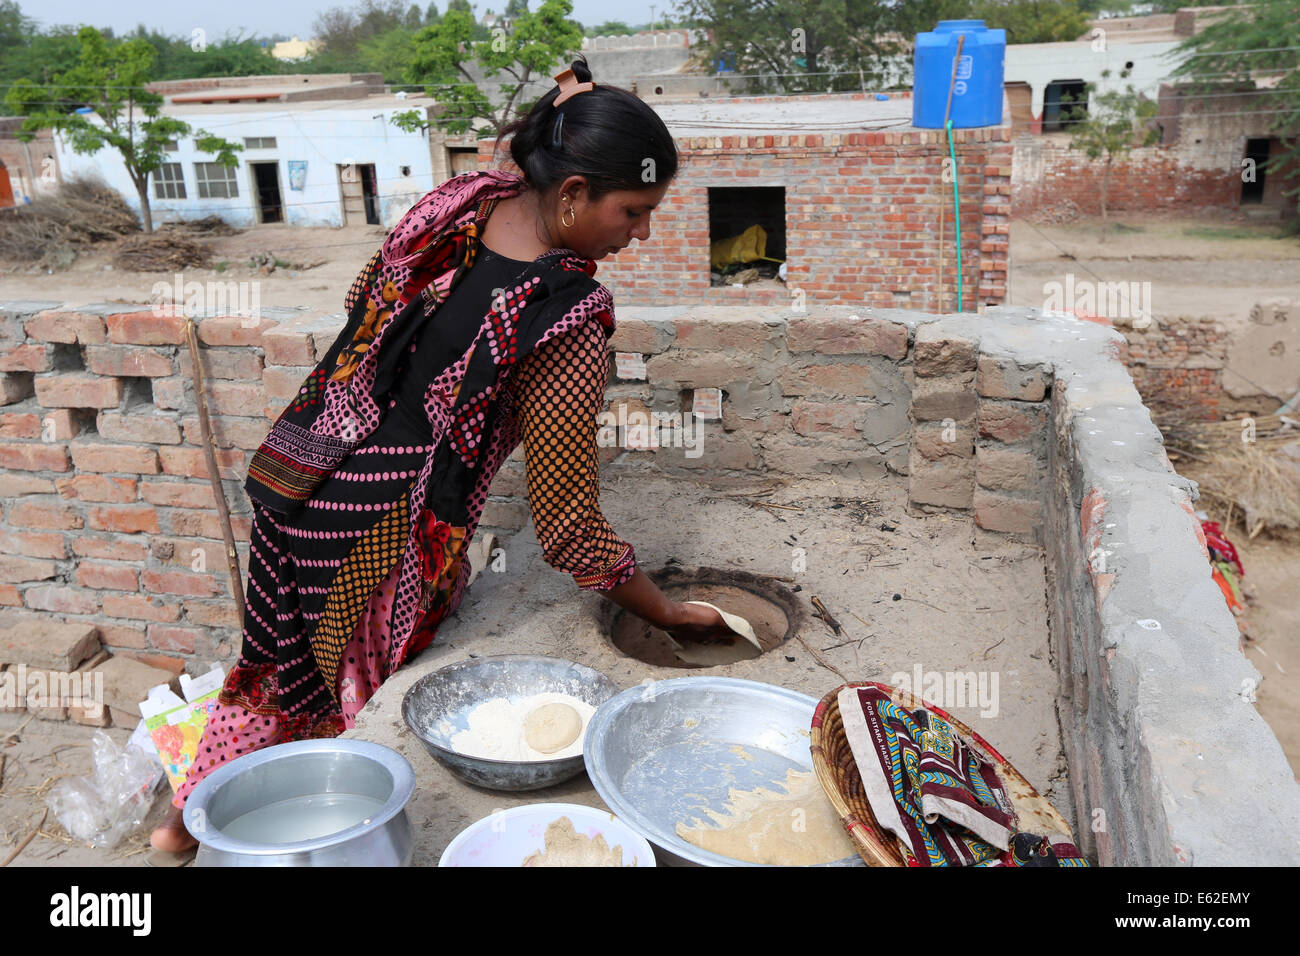 Image result for tandoori roti village